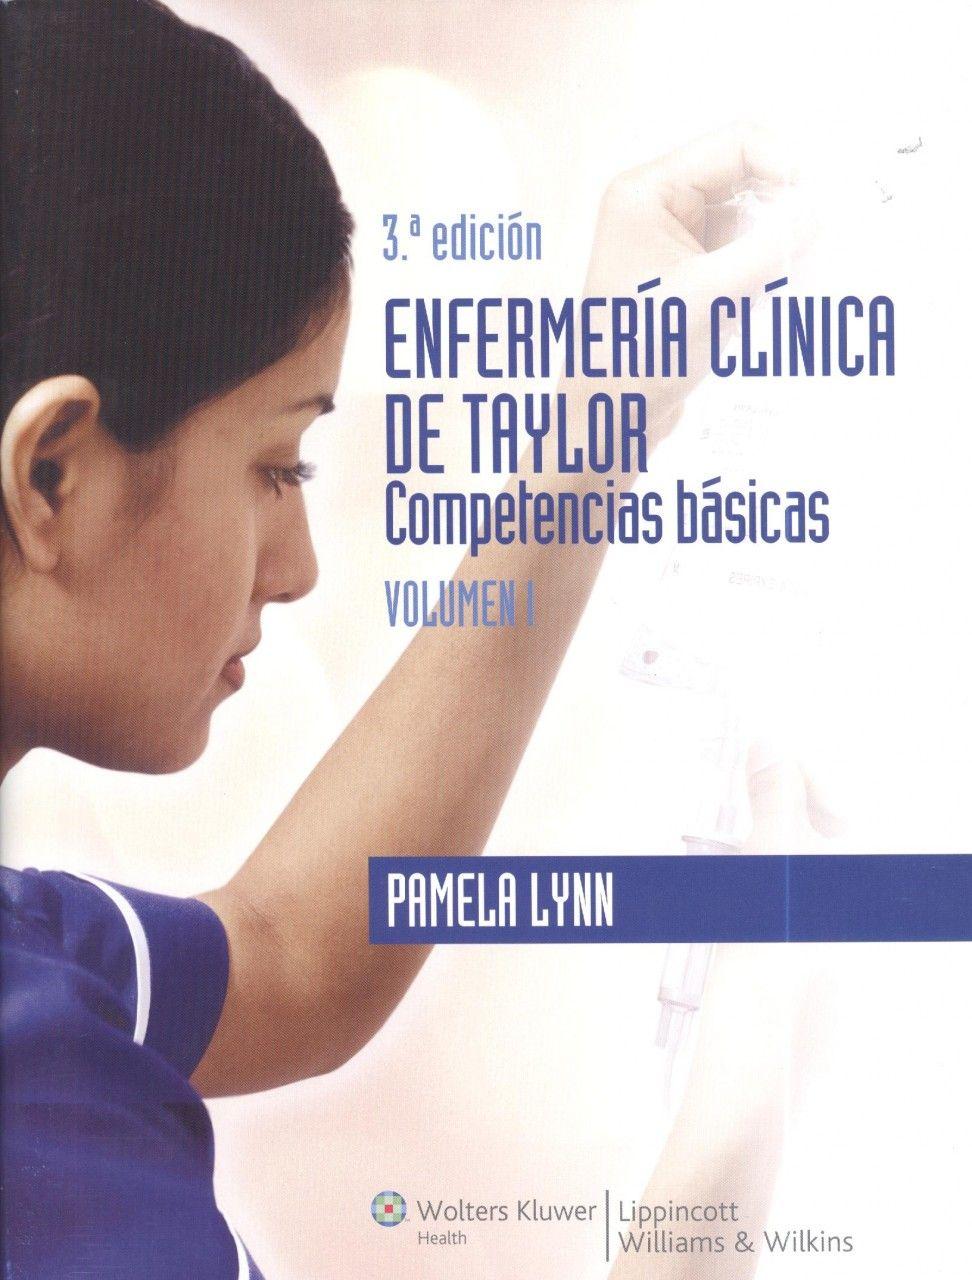 Enfermería clínica de Taylor. 3ª ed. 2012. http://www.thepoint.lww.com/Book/Show/252000 http://kmelot.biblioteca.udc.es/record=b1484815~S12*gag